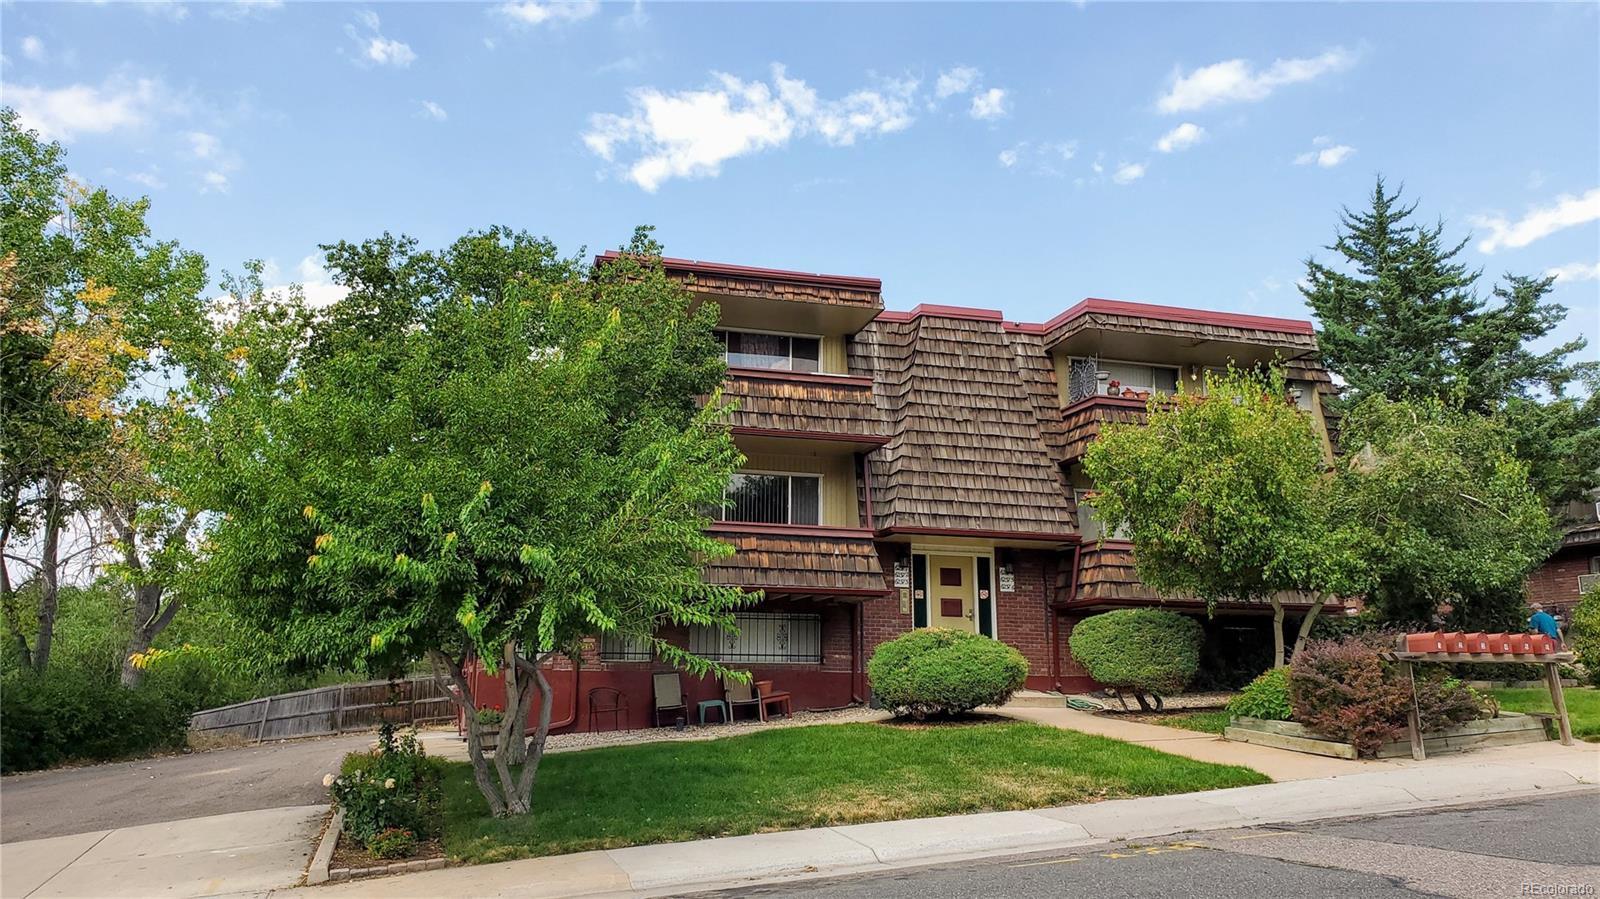 6237 Estes Street, Arvada, CO 80004 - Arvada, CO real estate listing